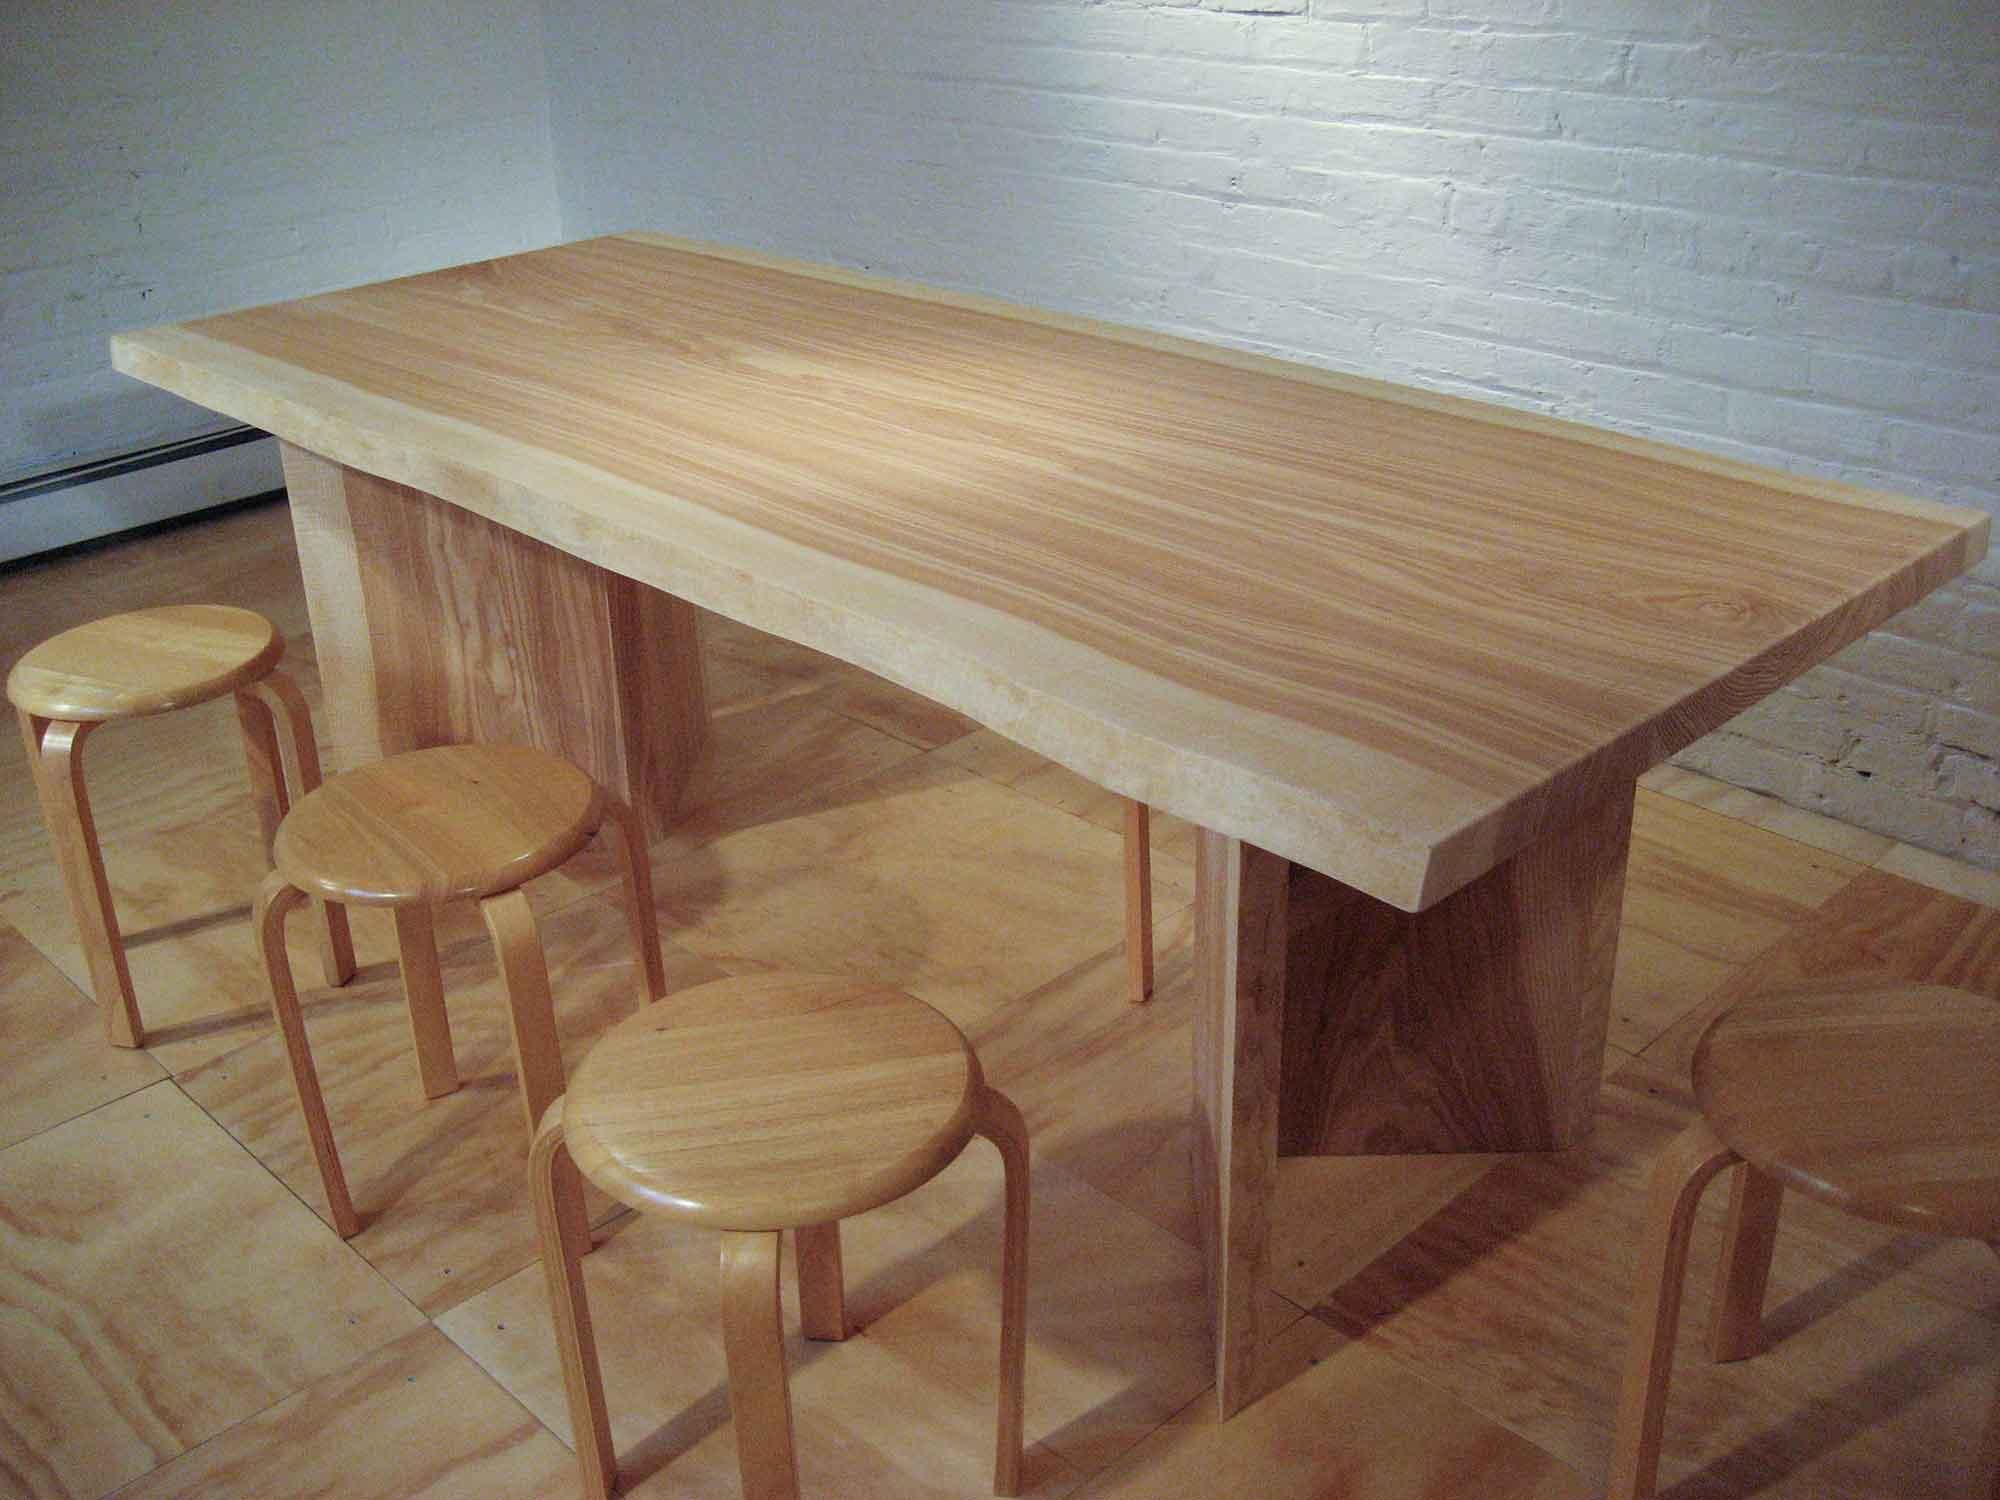 white-ash-chevron-table-2229.jpg